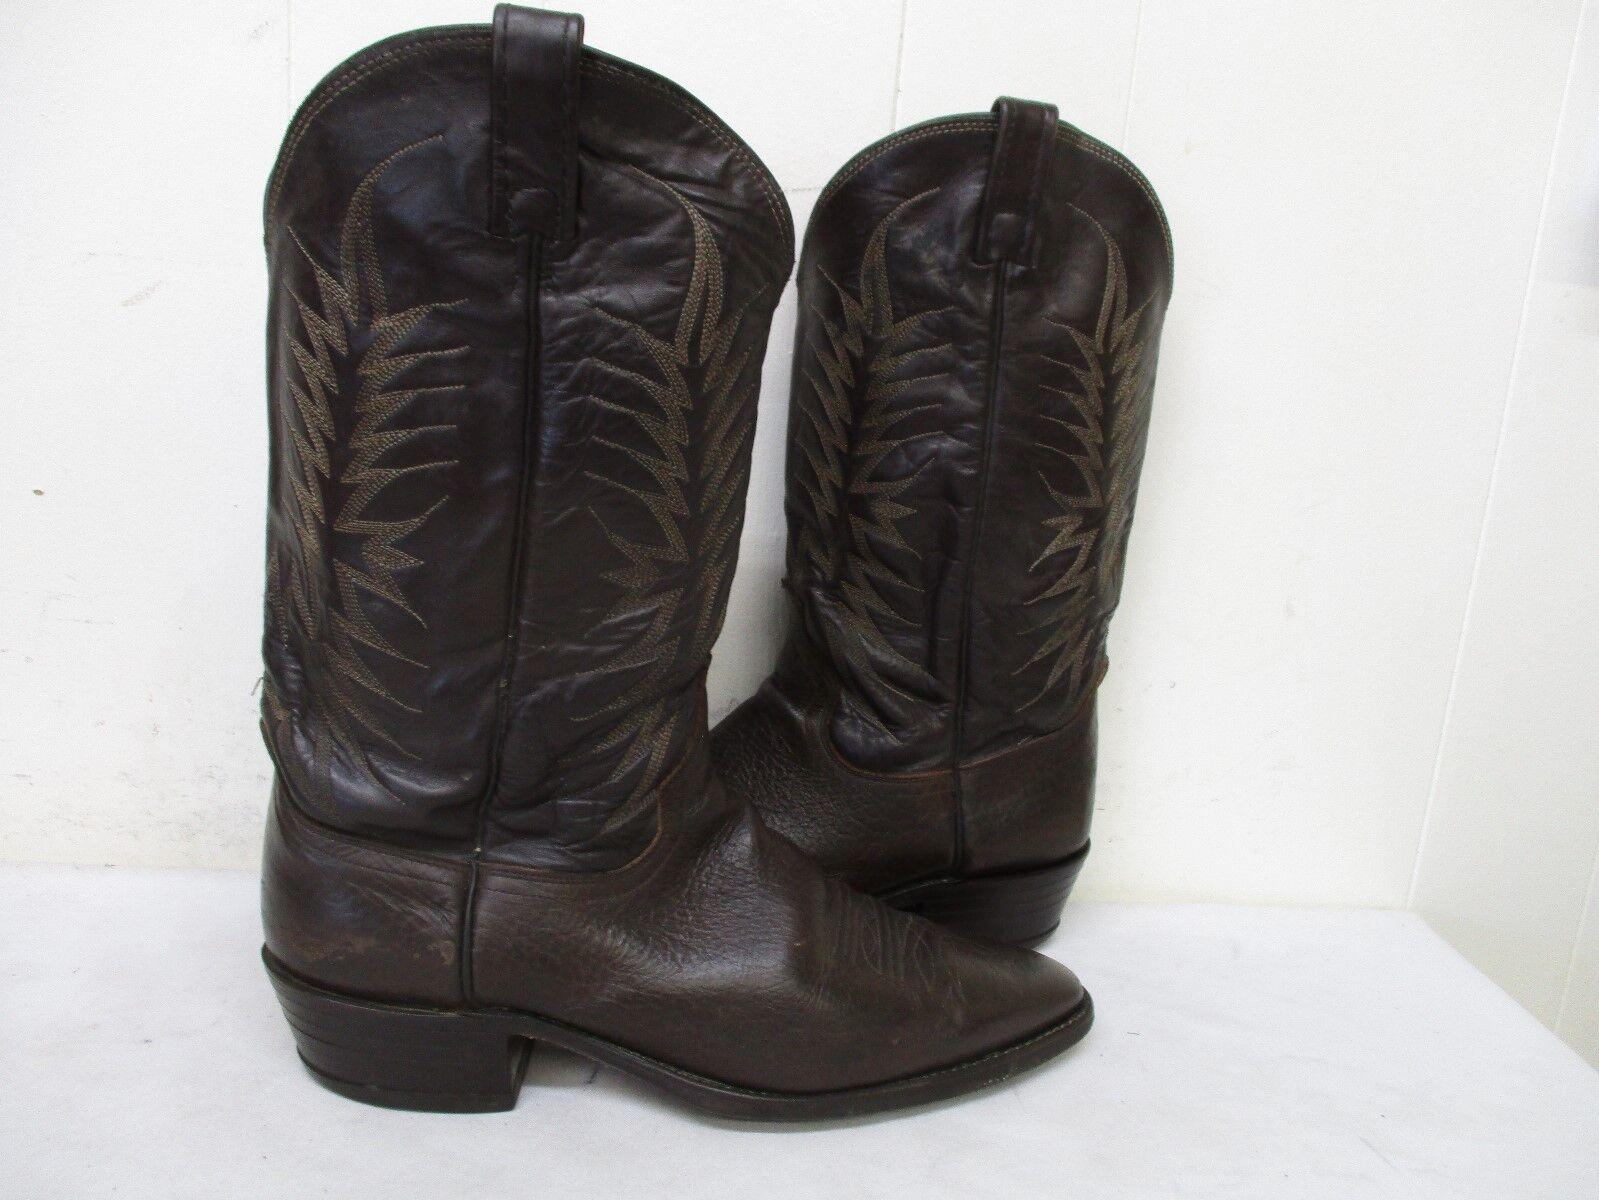 Dan Dan Dan brown bullhide post pelle gli stivali da cowboy Uomo 46 b stile p2559 usa bb6880